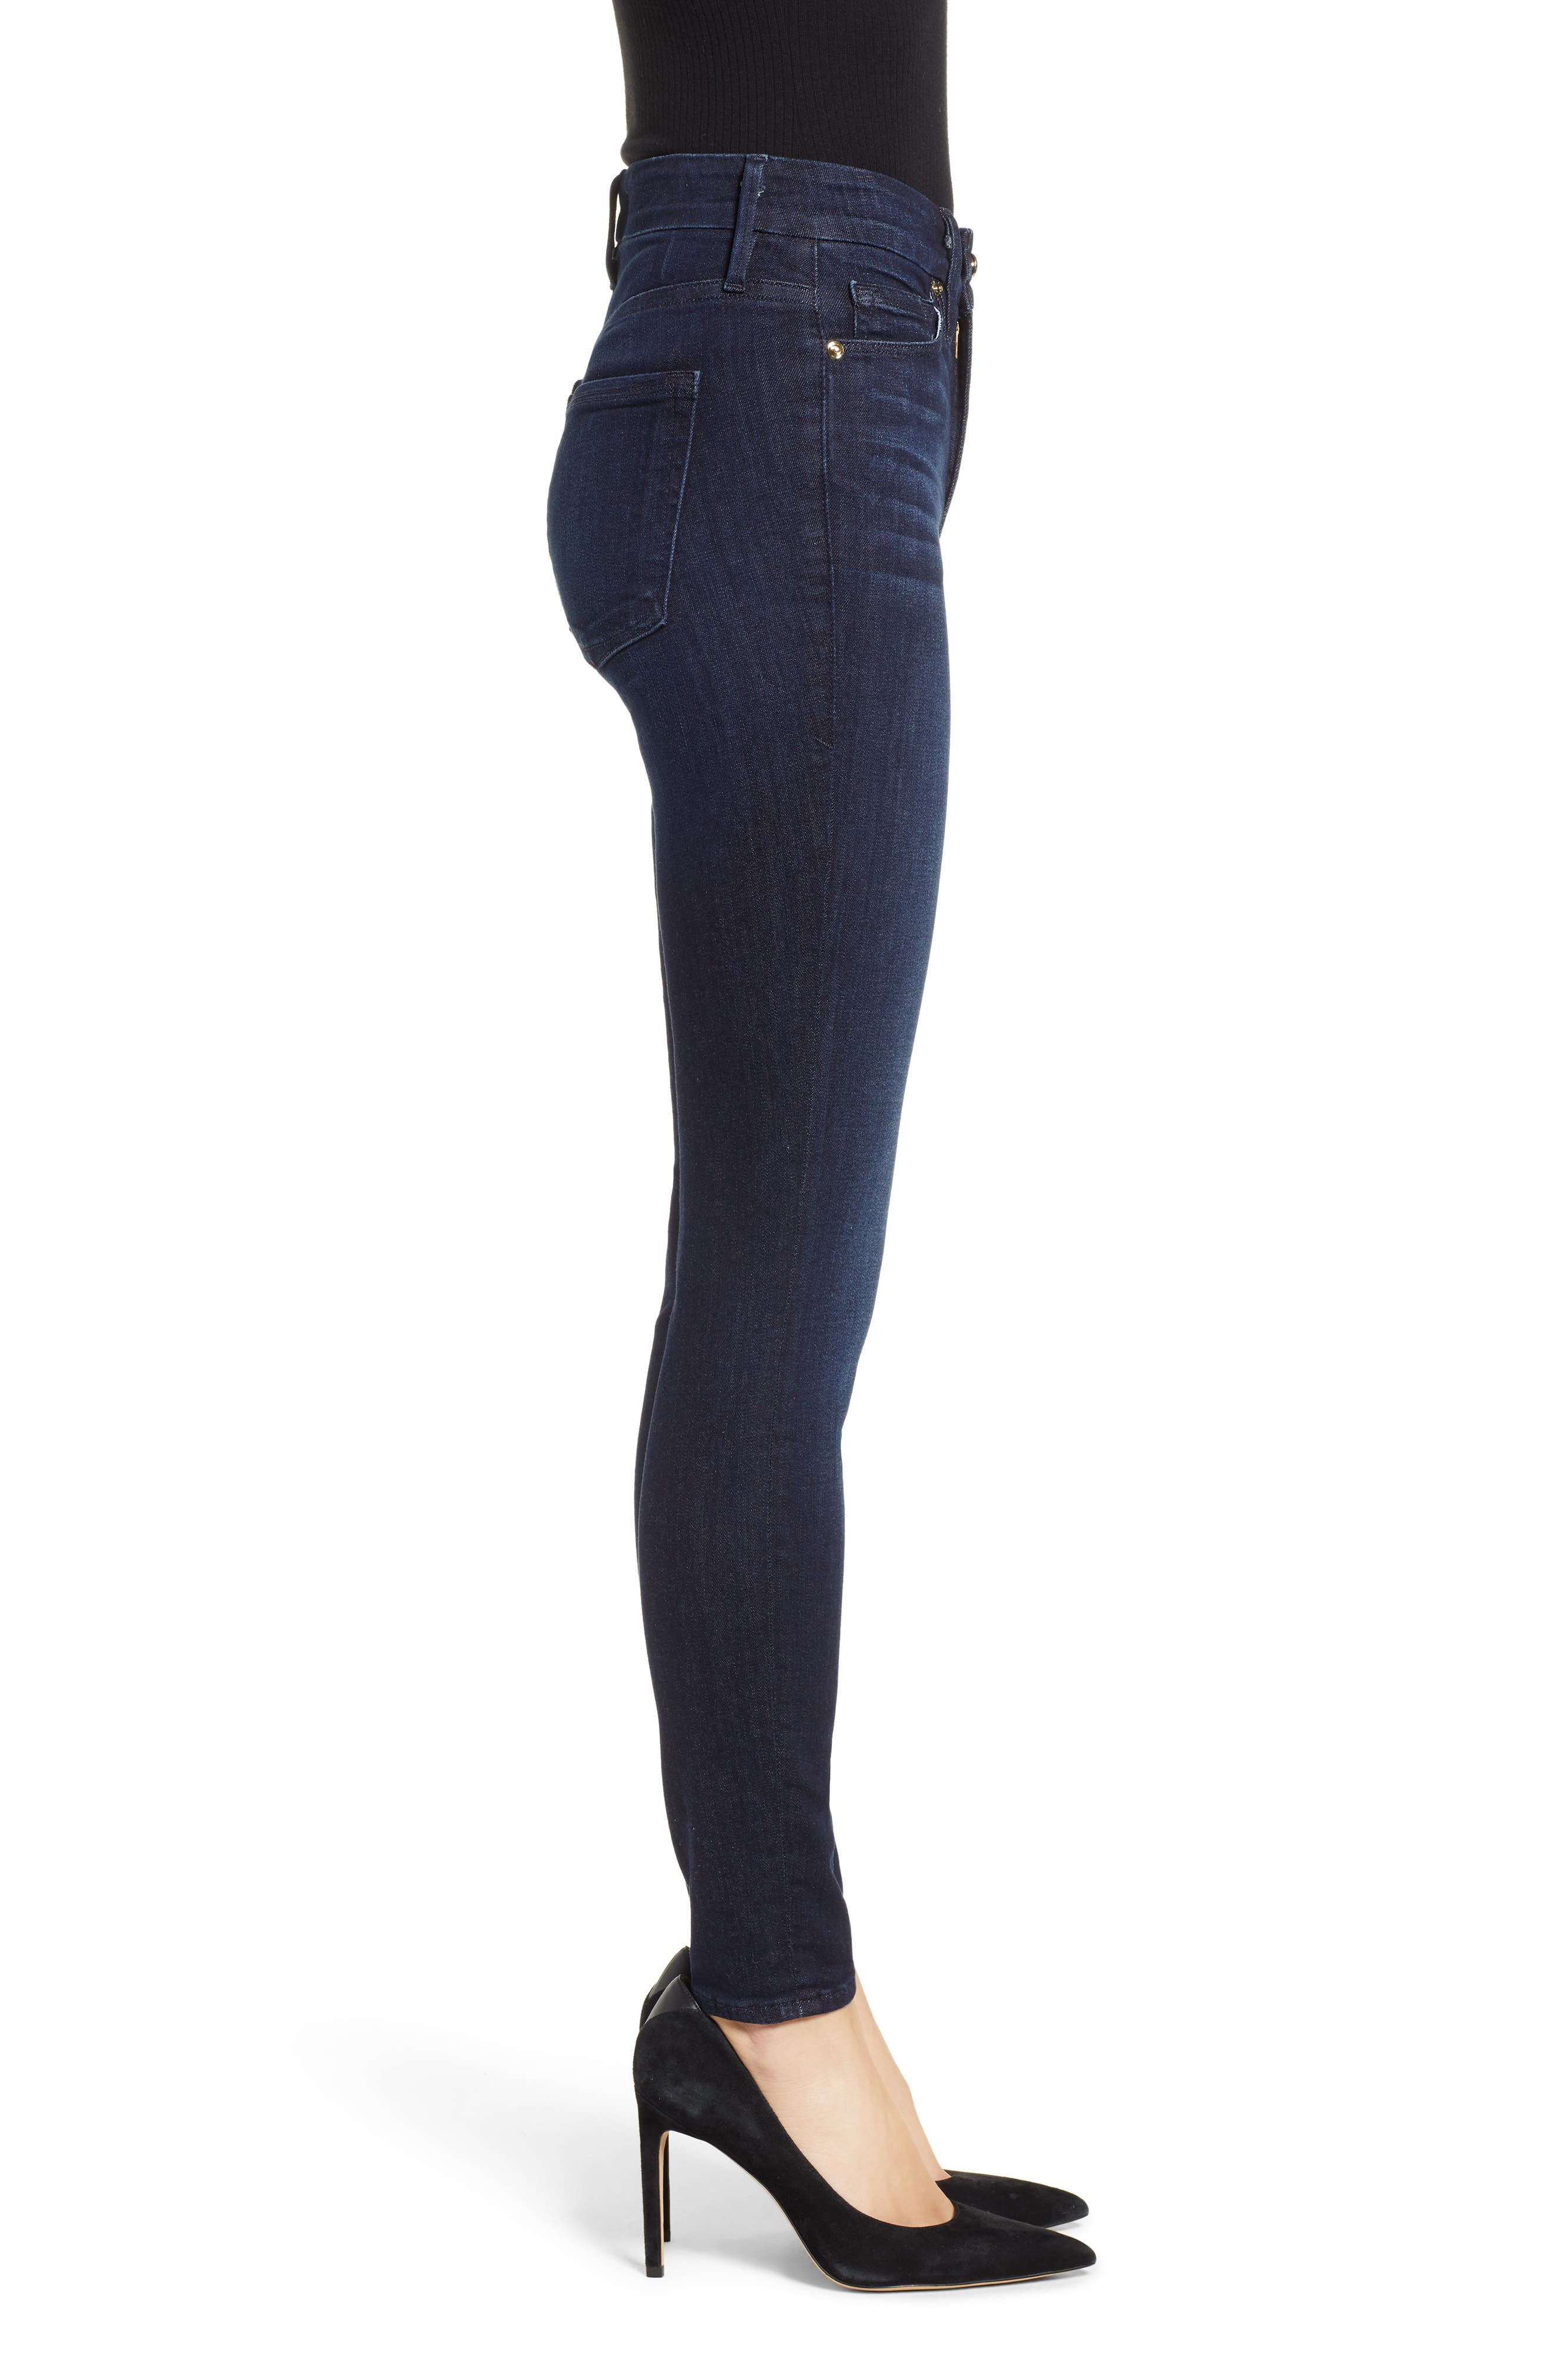 GOOD AMERICAN,                             Good Legs High Waist Skinny Jeans,                             Alternate thumbnail 4, color,                             BLUE224